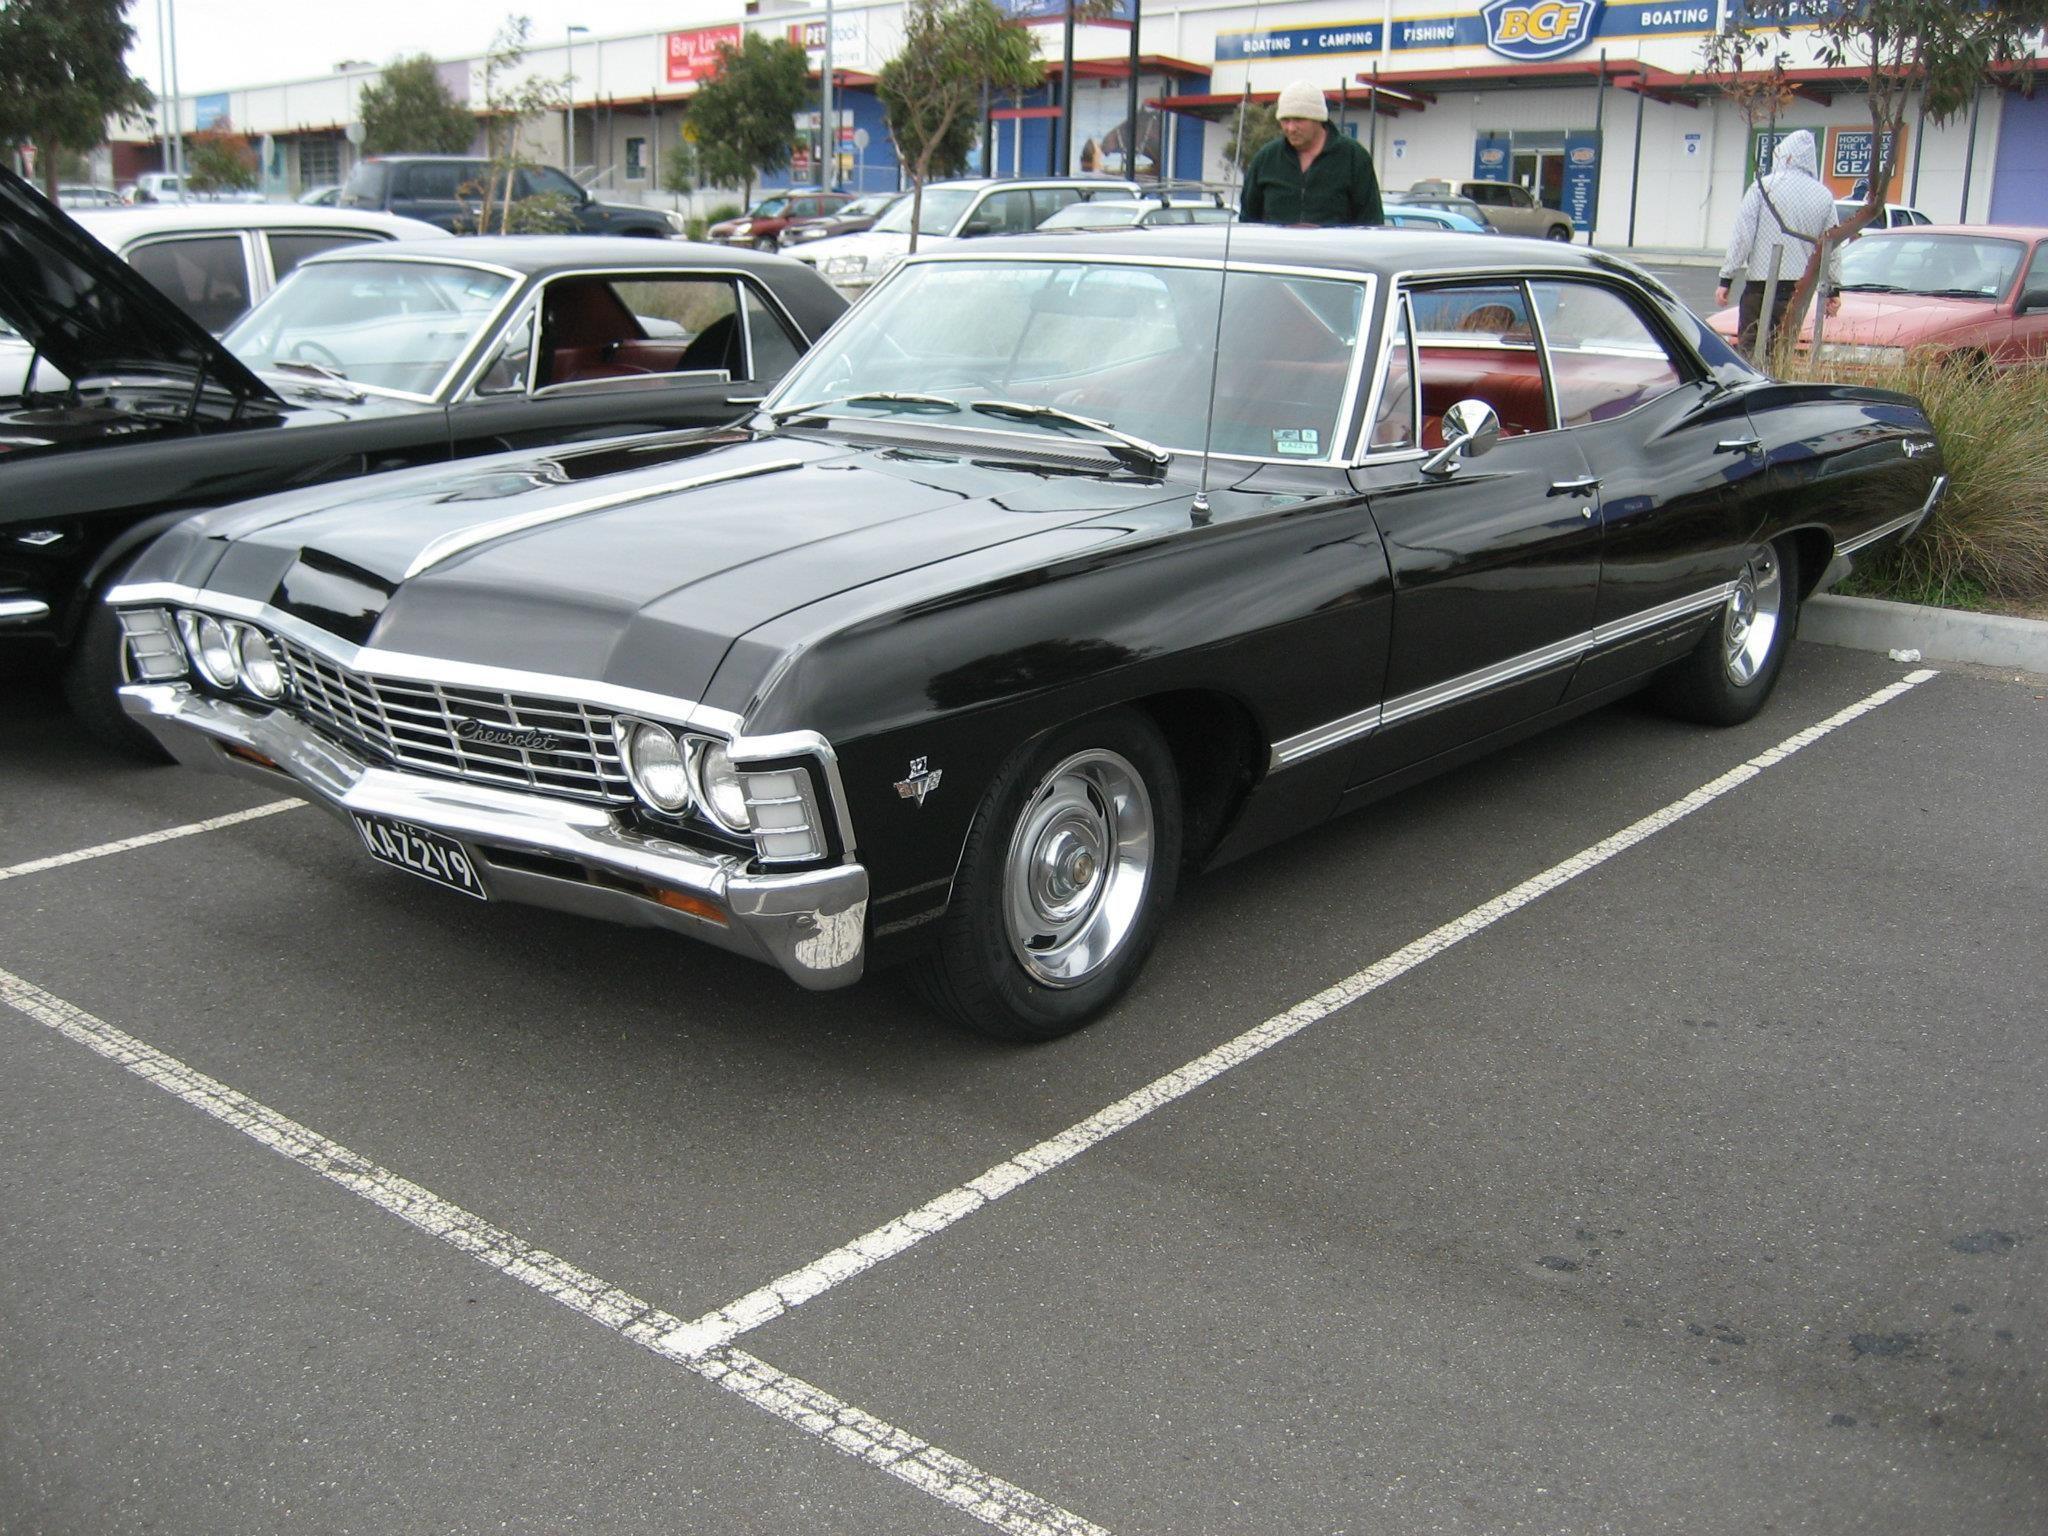 1967 Chevy Impala Chevrolet Impala Chevrolet Impala 1967 Chevy